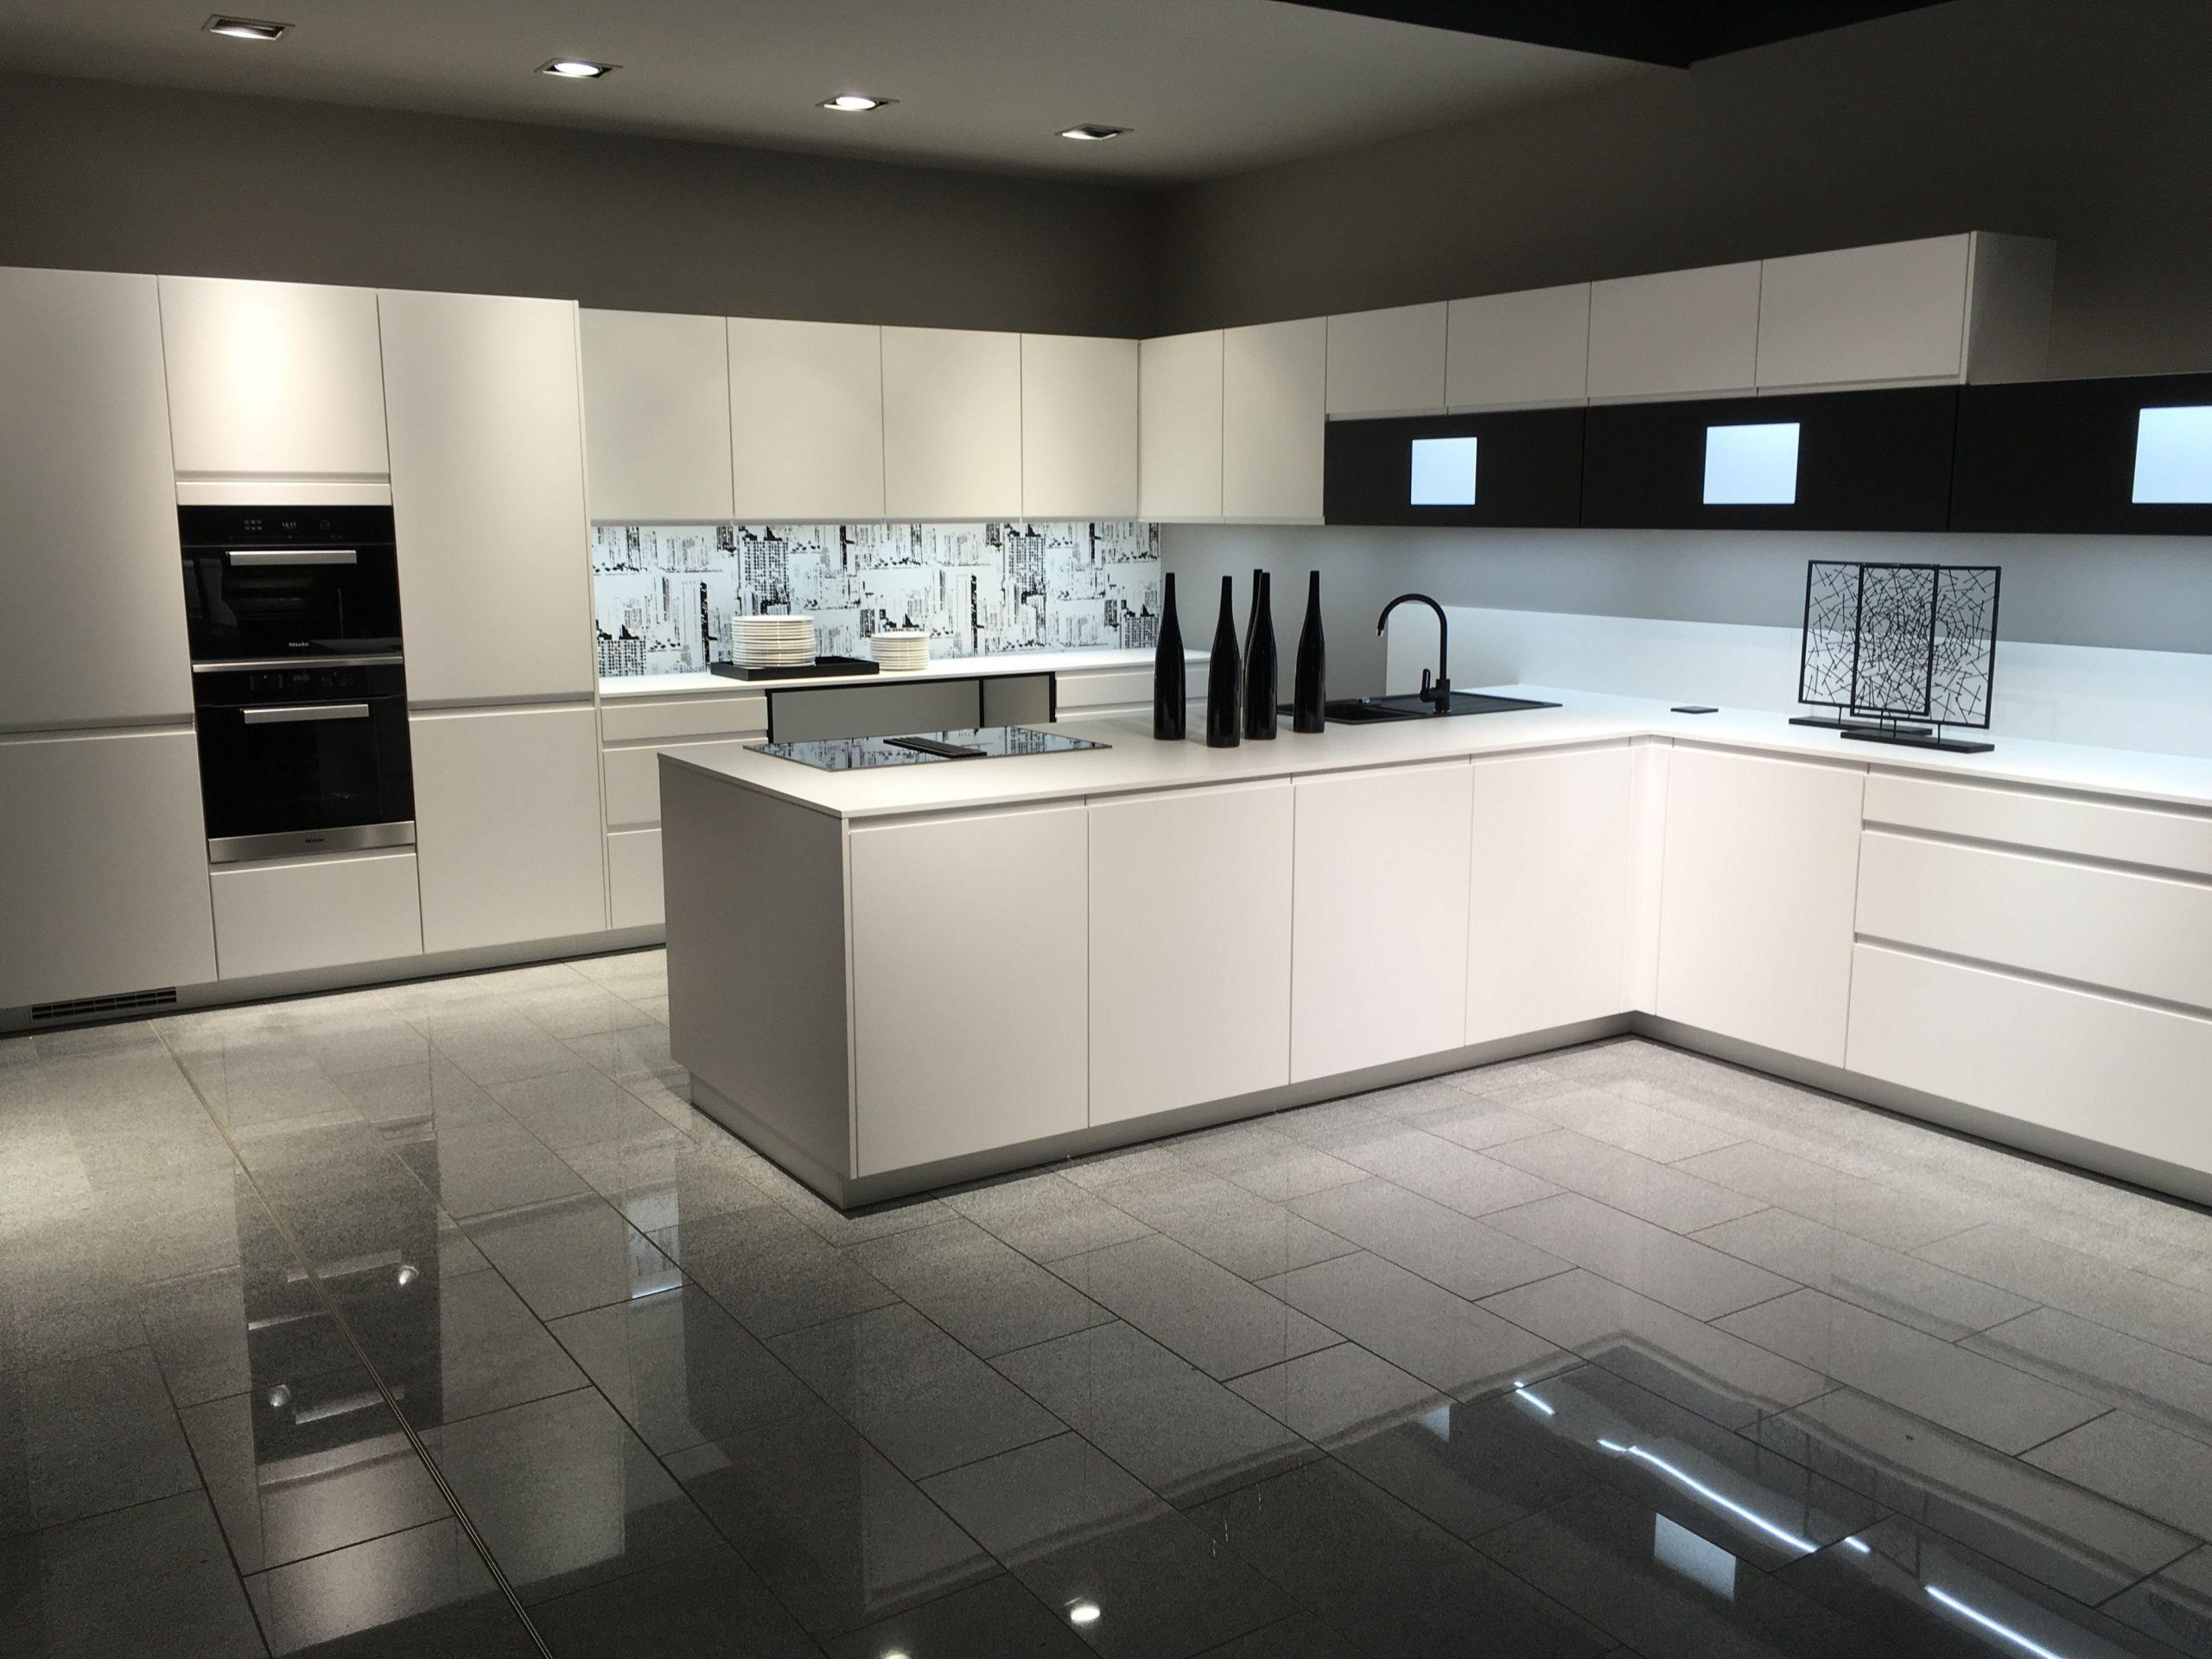 Full Size of Küchenrückwand Dunkel Küchenrückwand Eiche Küche Nischenrückwand Wie Hoch Rückwand Küche Montage Küche Nischenrückwand Küche